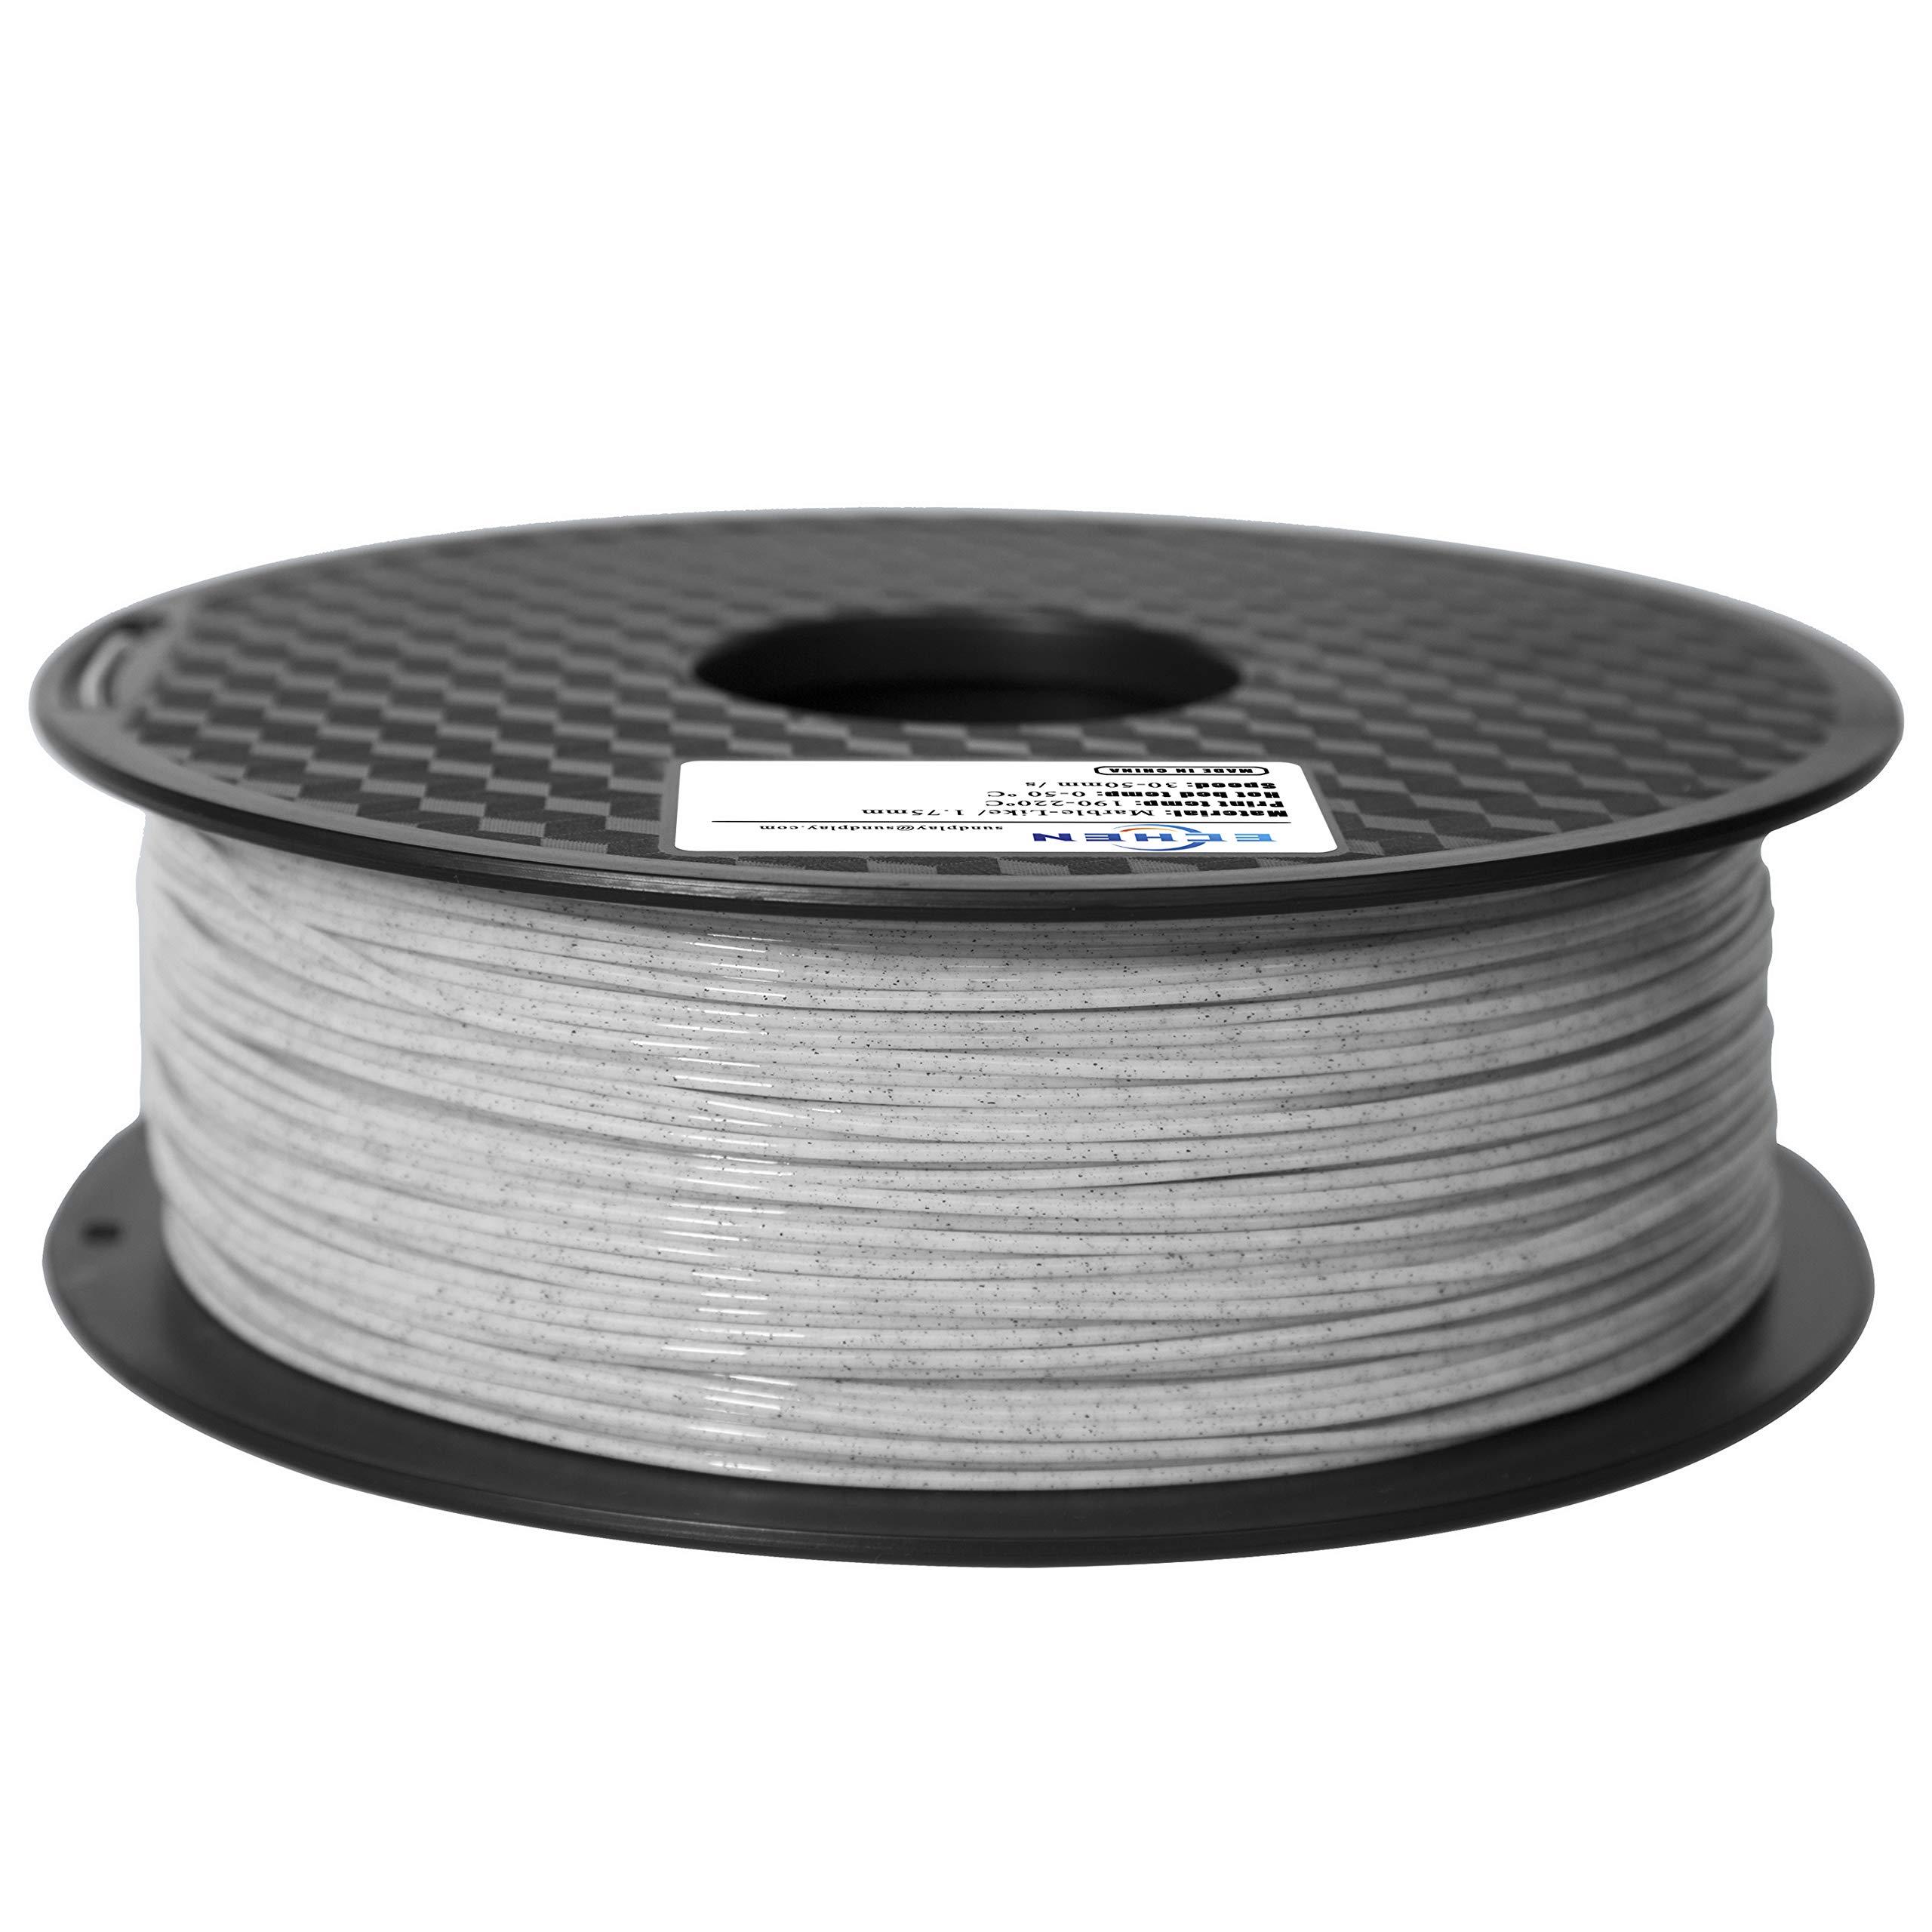 Filamento PLA 1.75mm 1kg COLOR FOTO-1 IMP 3D [7QMN3XT5]